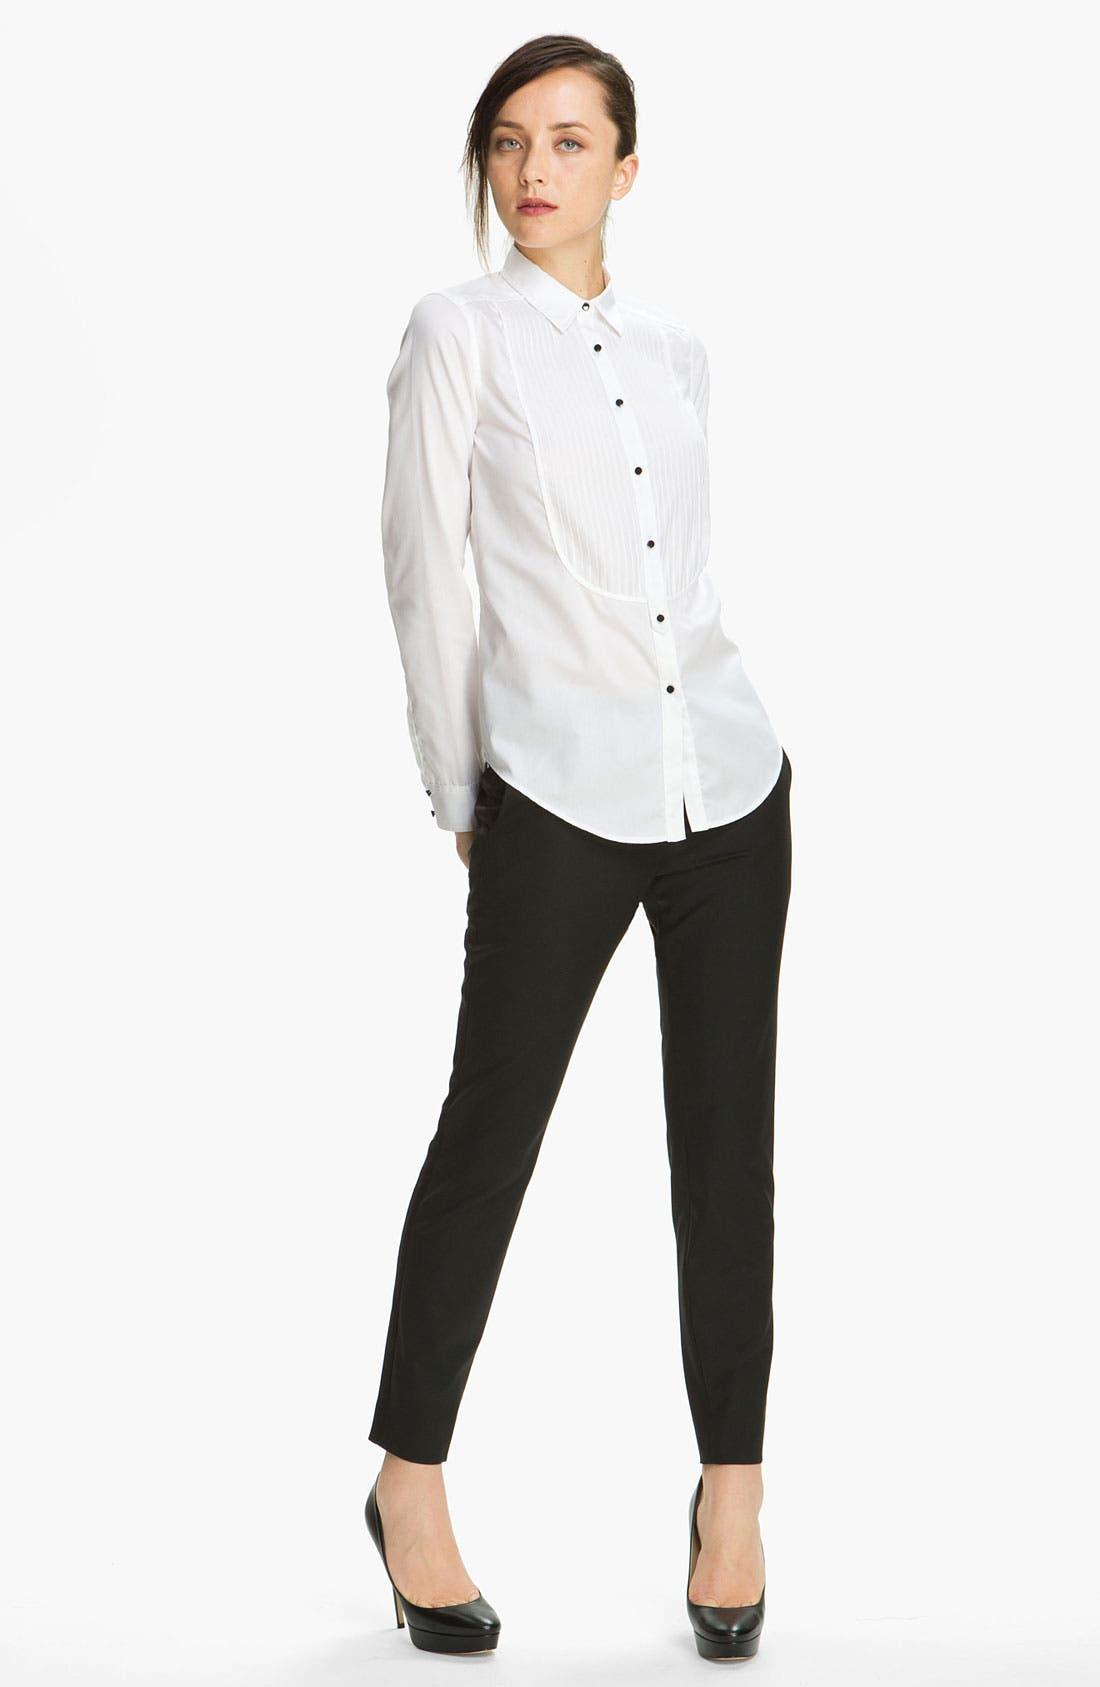 Alternate Image 1 Selected - Elizabeth and James 'Carter' Tuxedo Shirt